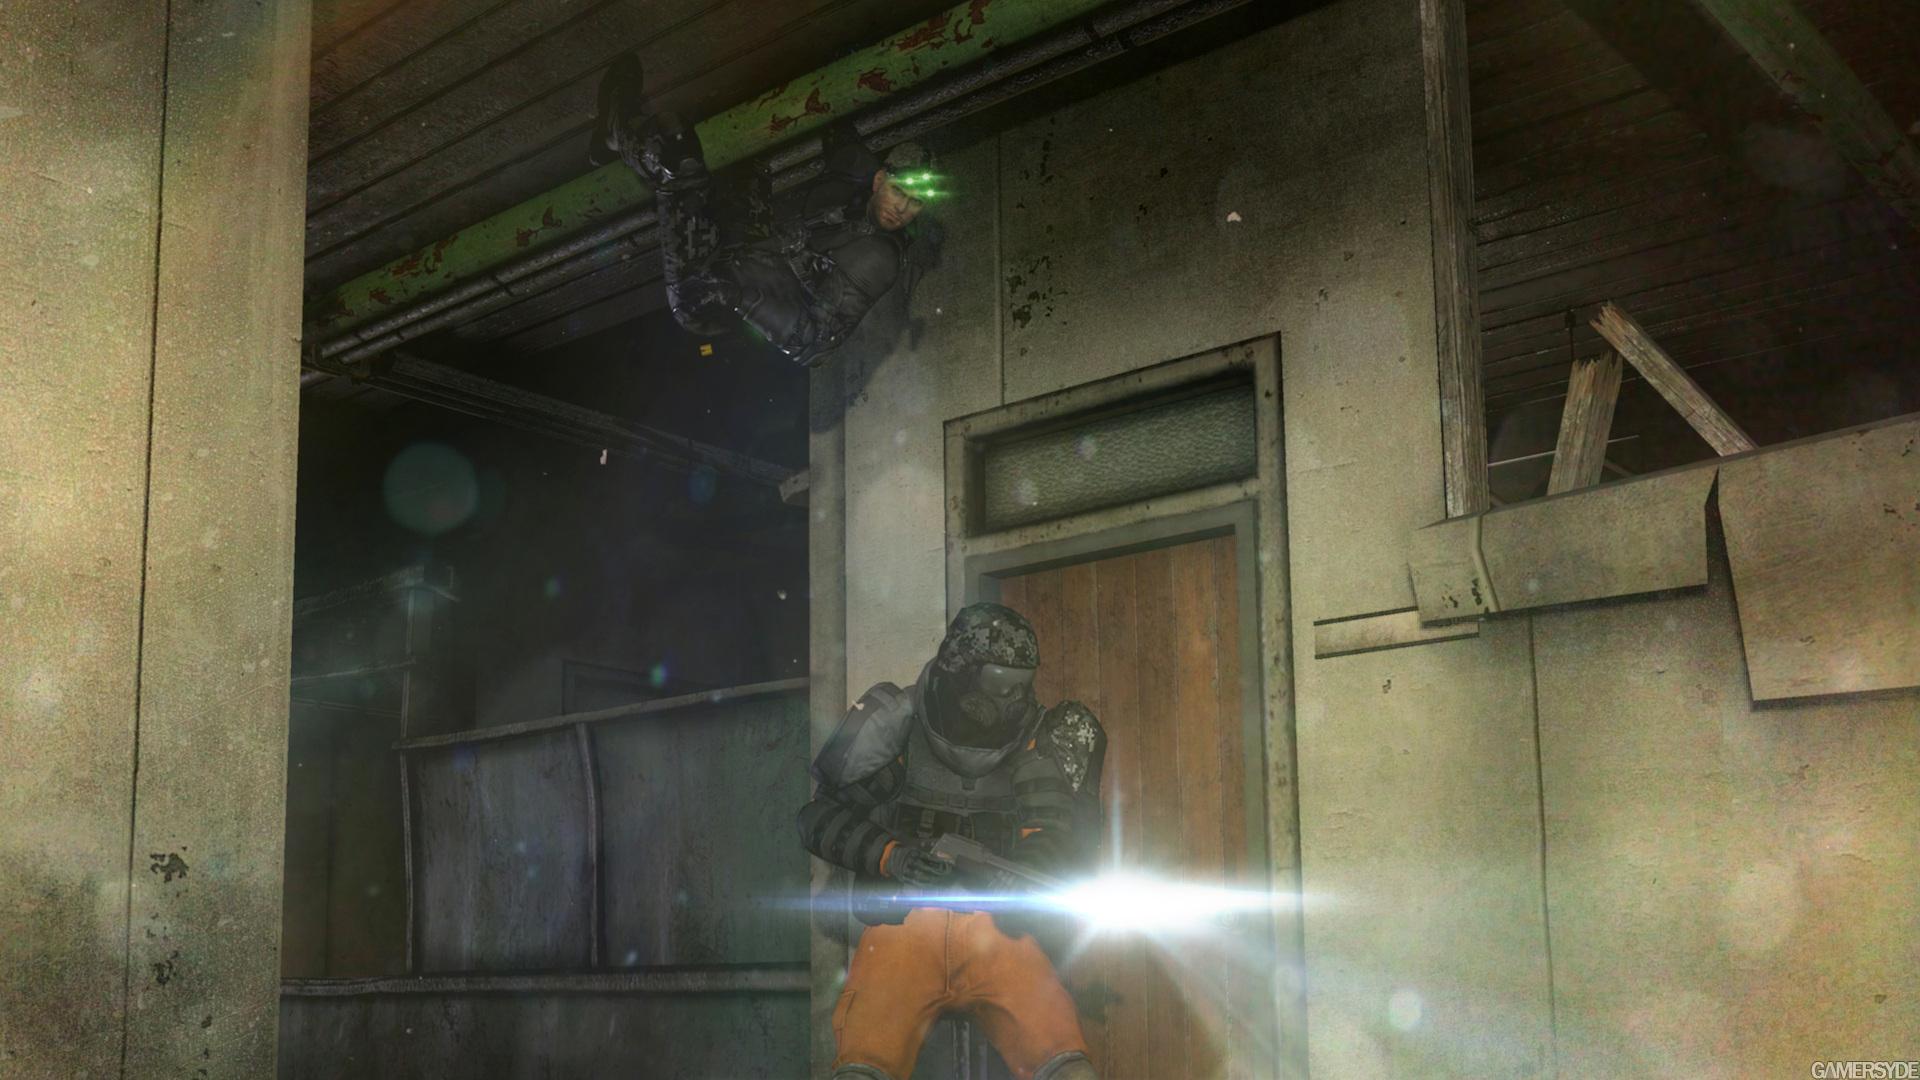 image tom clancy s splinter cell blacklist 22410 2521 0001 با تصاویر جدید Splinter Cell: Blacklist همراه باشید